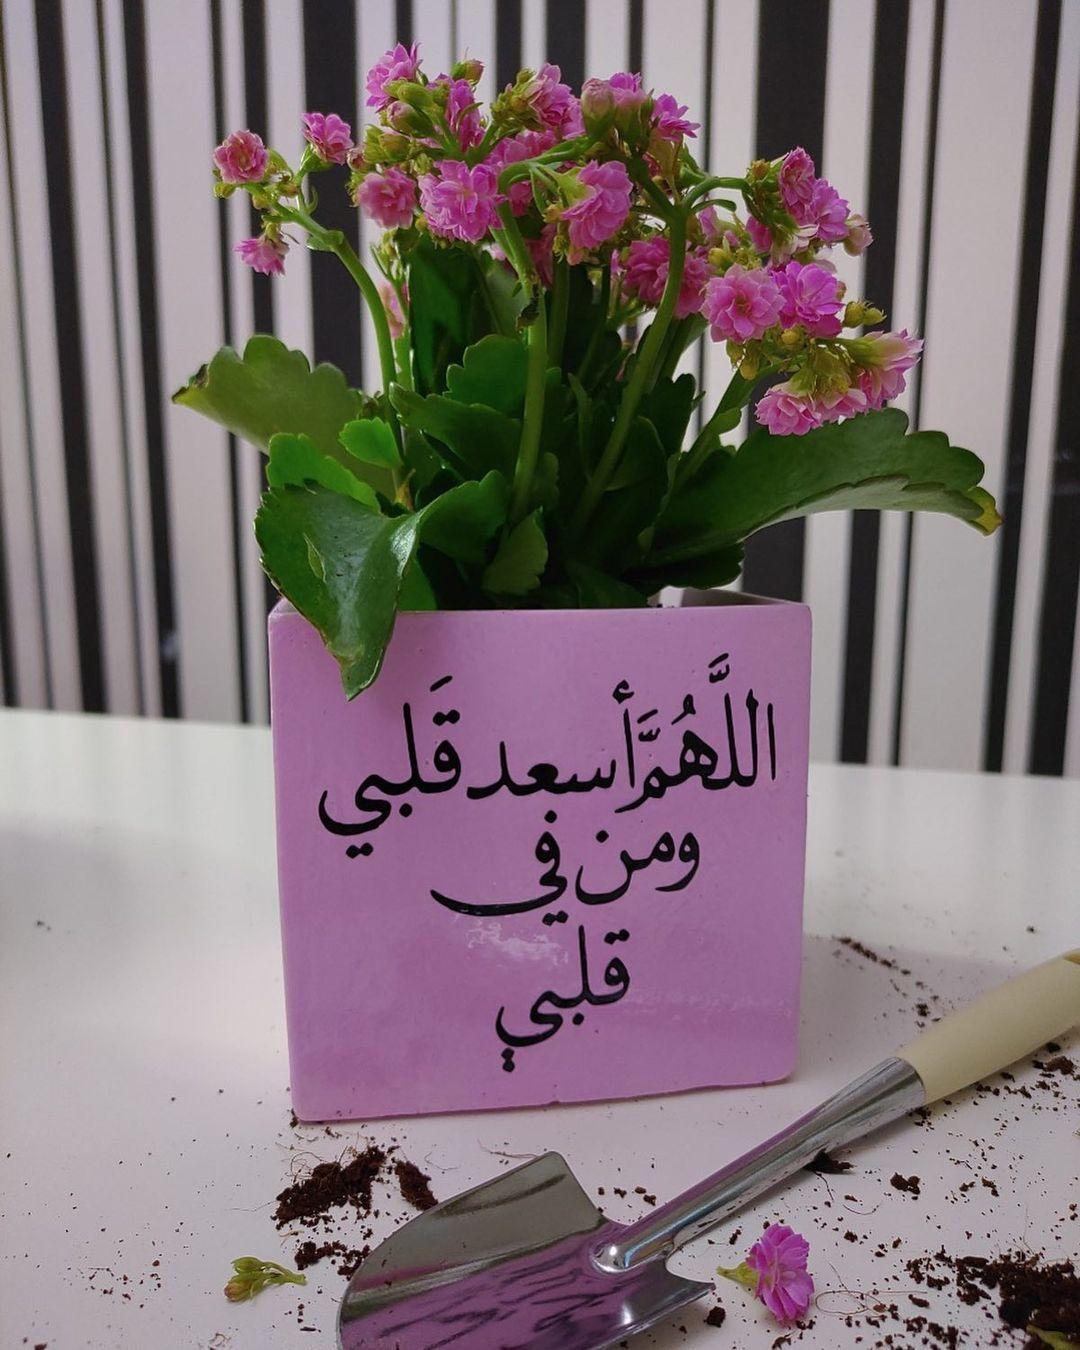 Technique On Instagram اللهم اسعد قلبي ومن في قلبي Technique Art Craft Gifts Flowers Plants Glass Vase Vase Glass